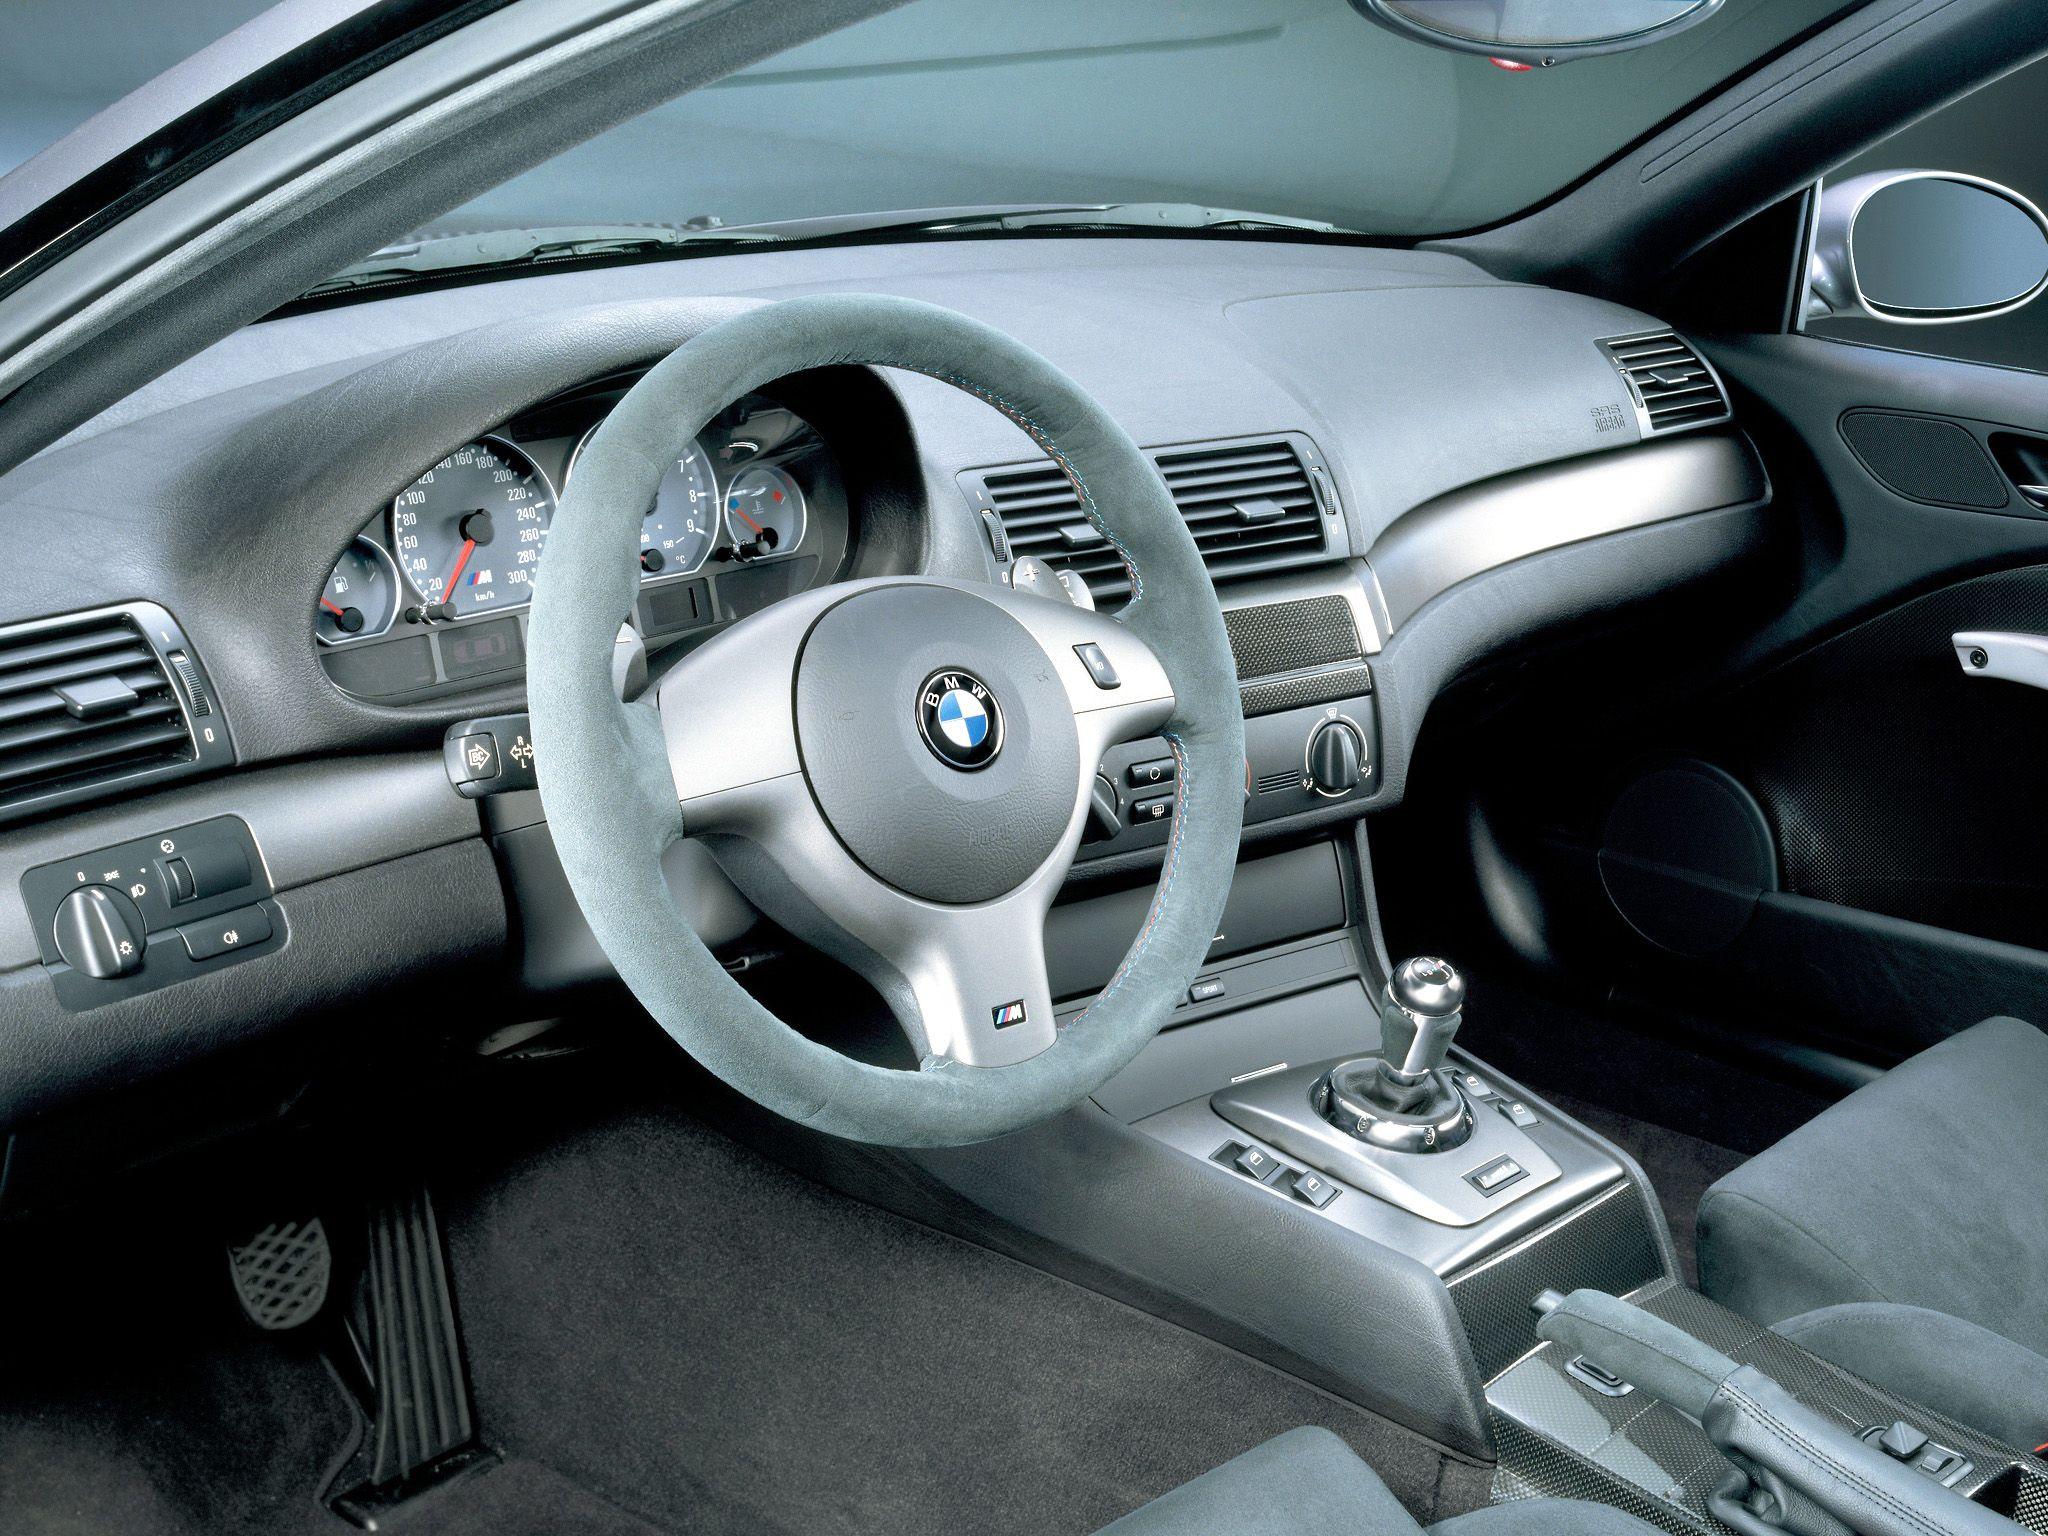 2003 bmw m3 interior [ 2048 x 1536 Pixel ]